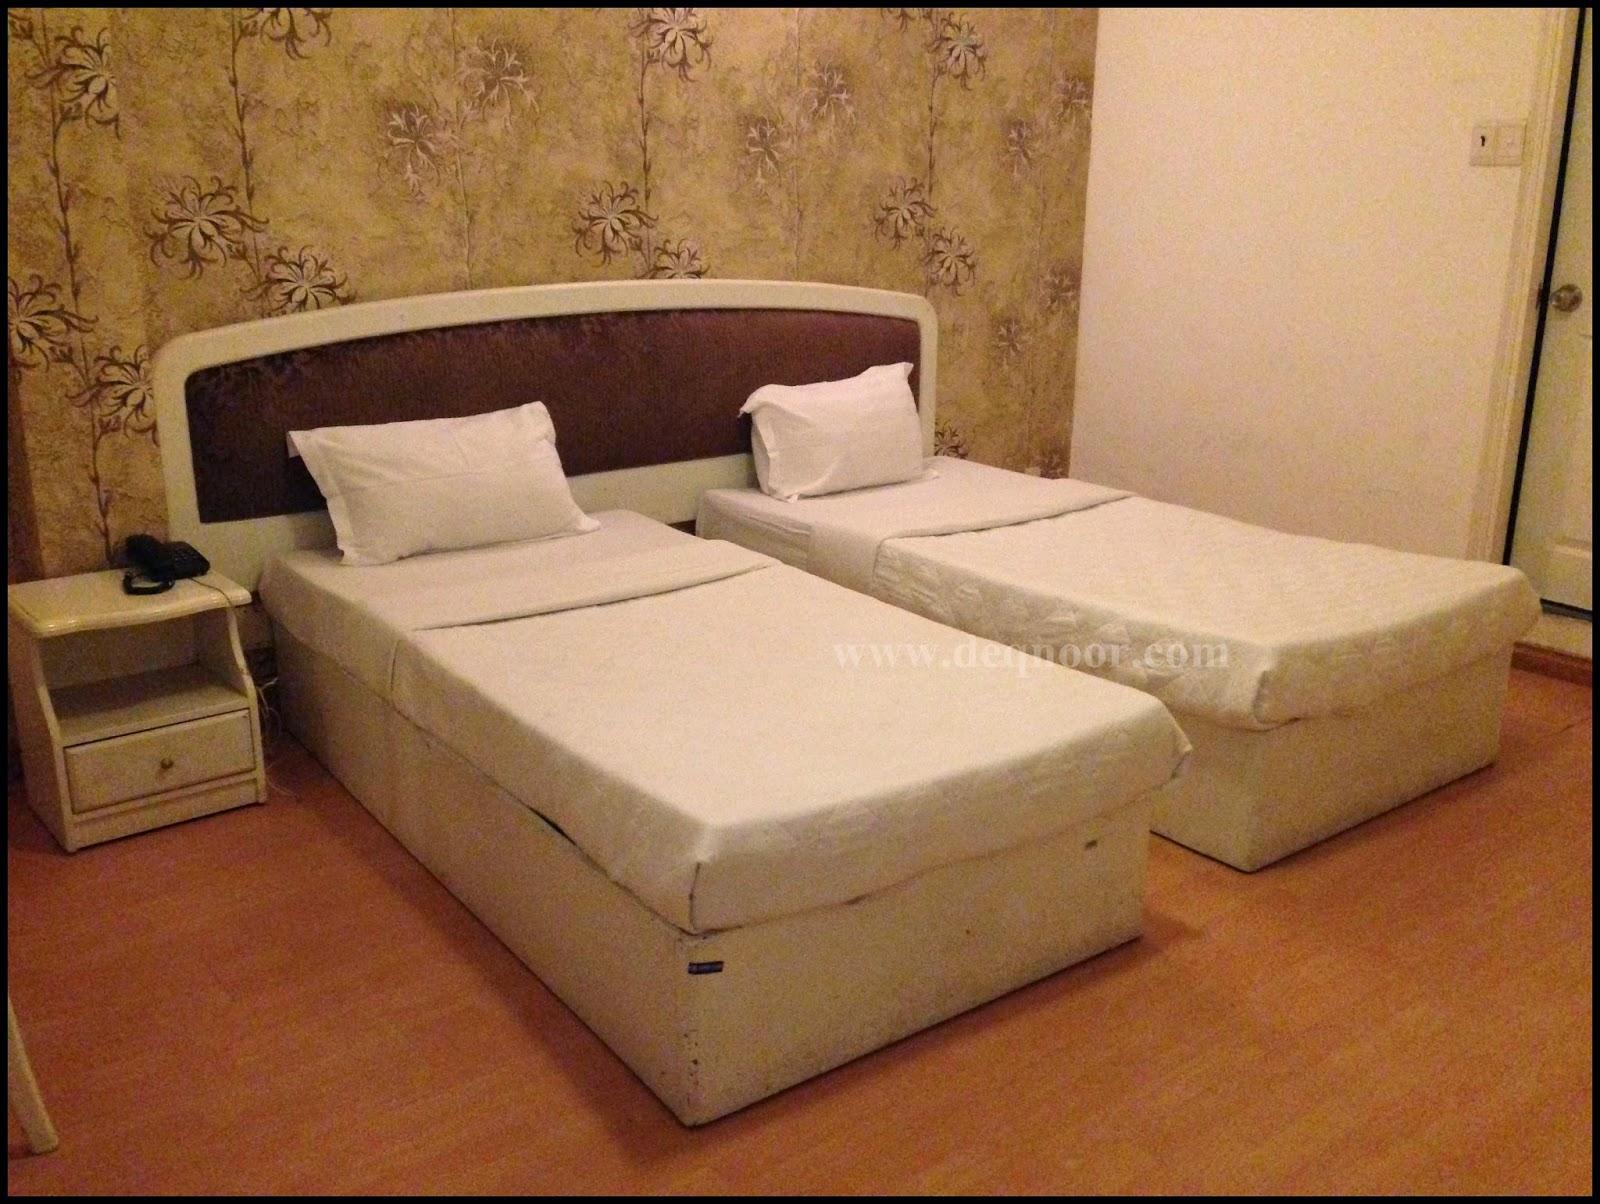 Saigon Pink 2 Hotel - 2 Single Bed